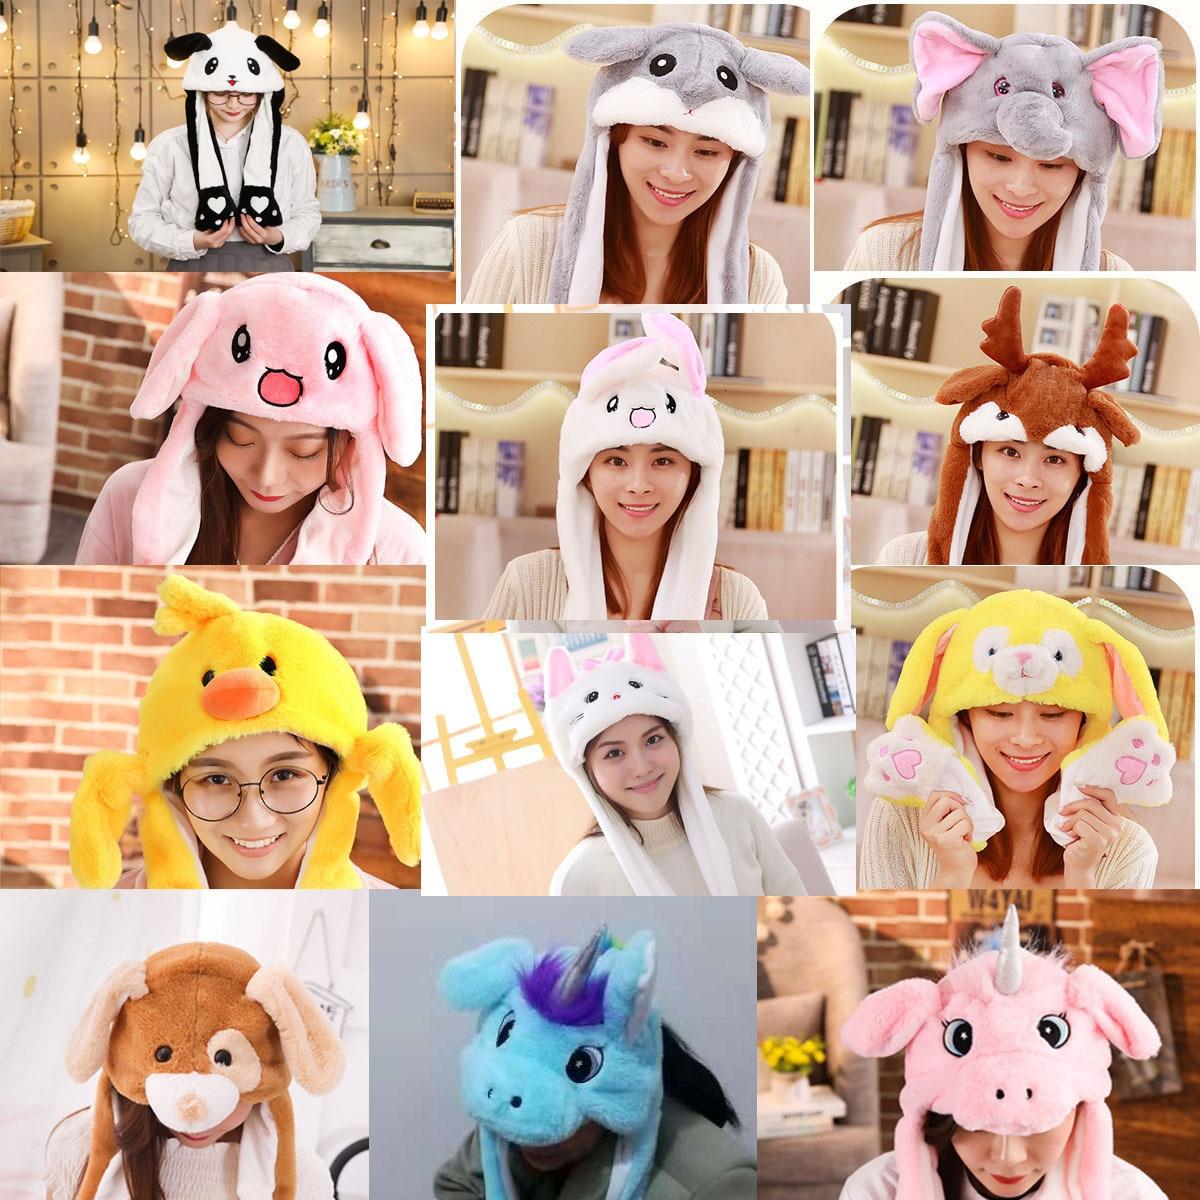 Cute Moving Ear Hat Pikachu Unicorn Stitch Cartoon Plush Novelty Cap Gift